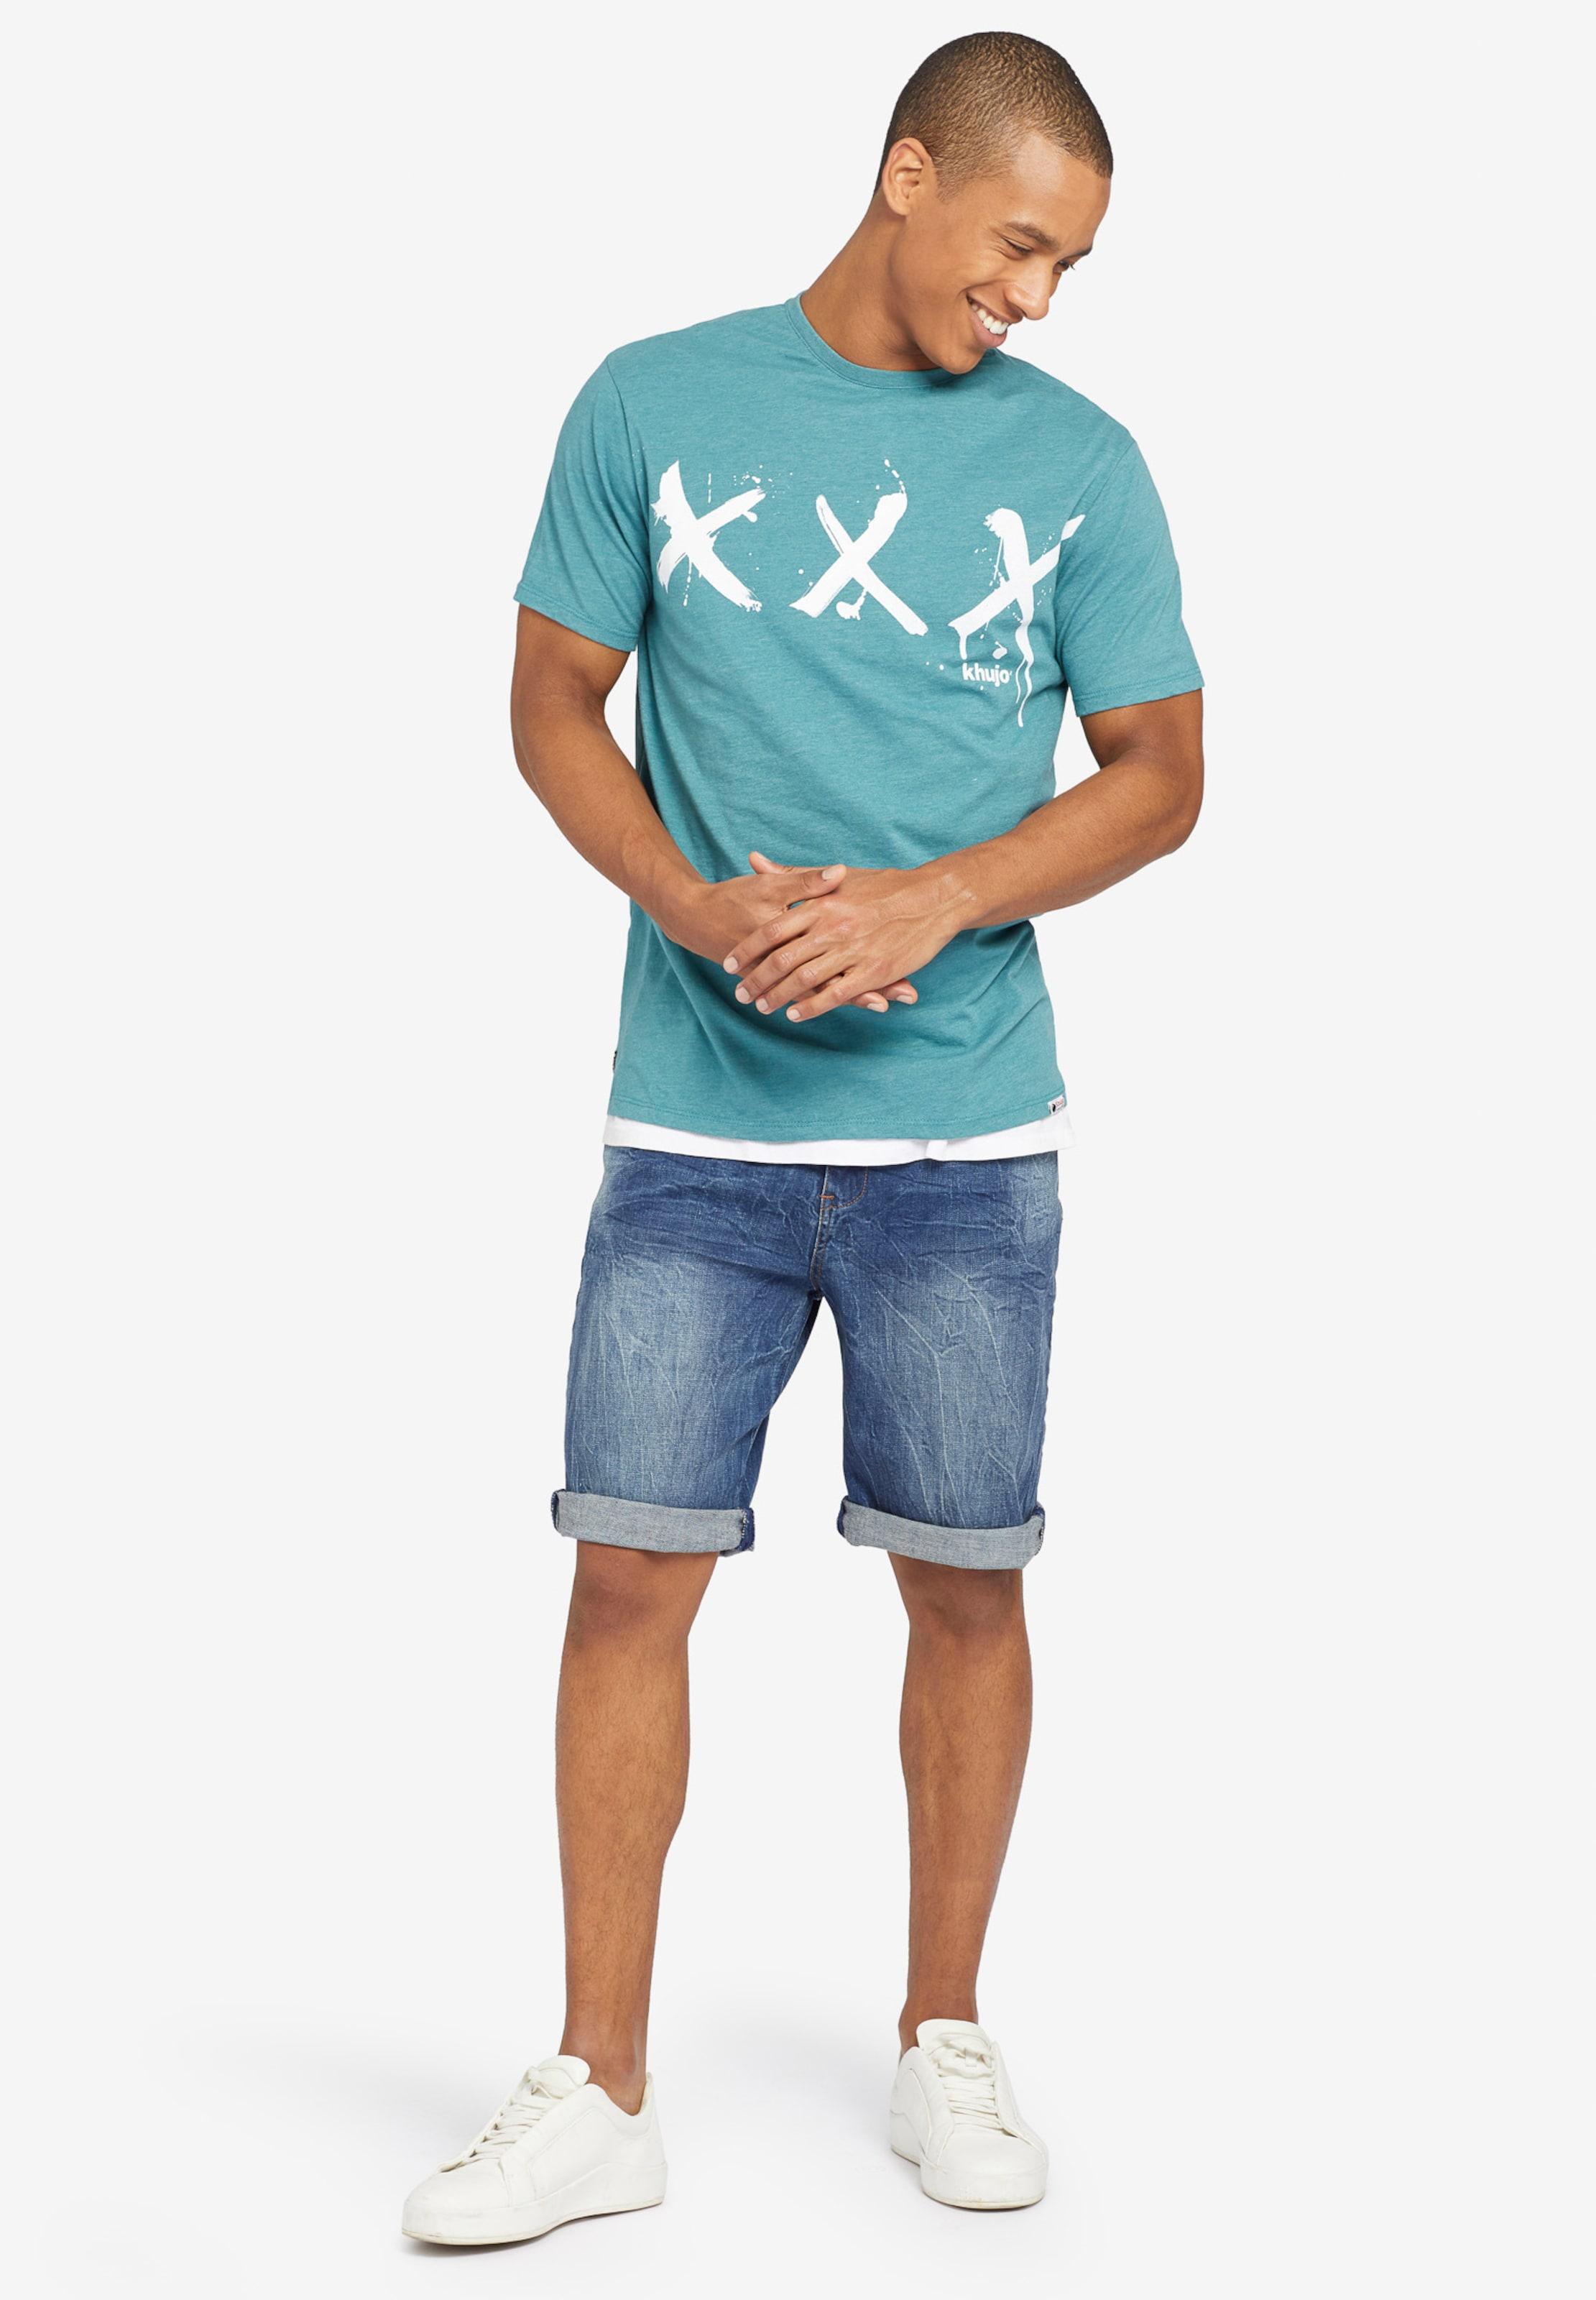 shirt 'uslo Tripplex' T Khujo En JadeBlanc UqVzSMpG